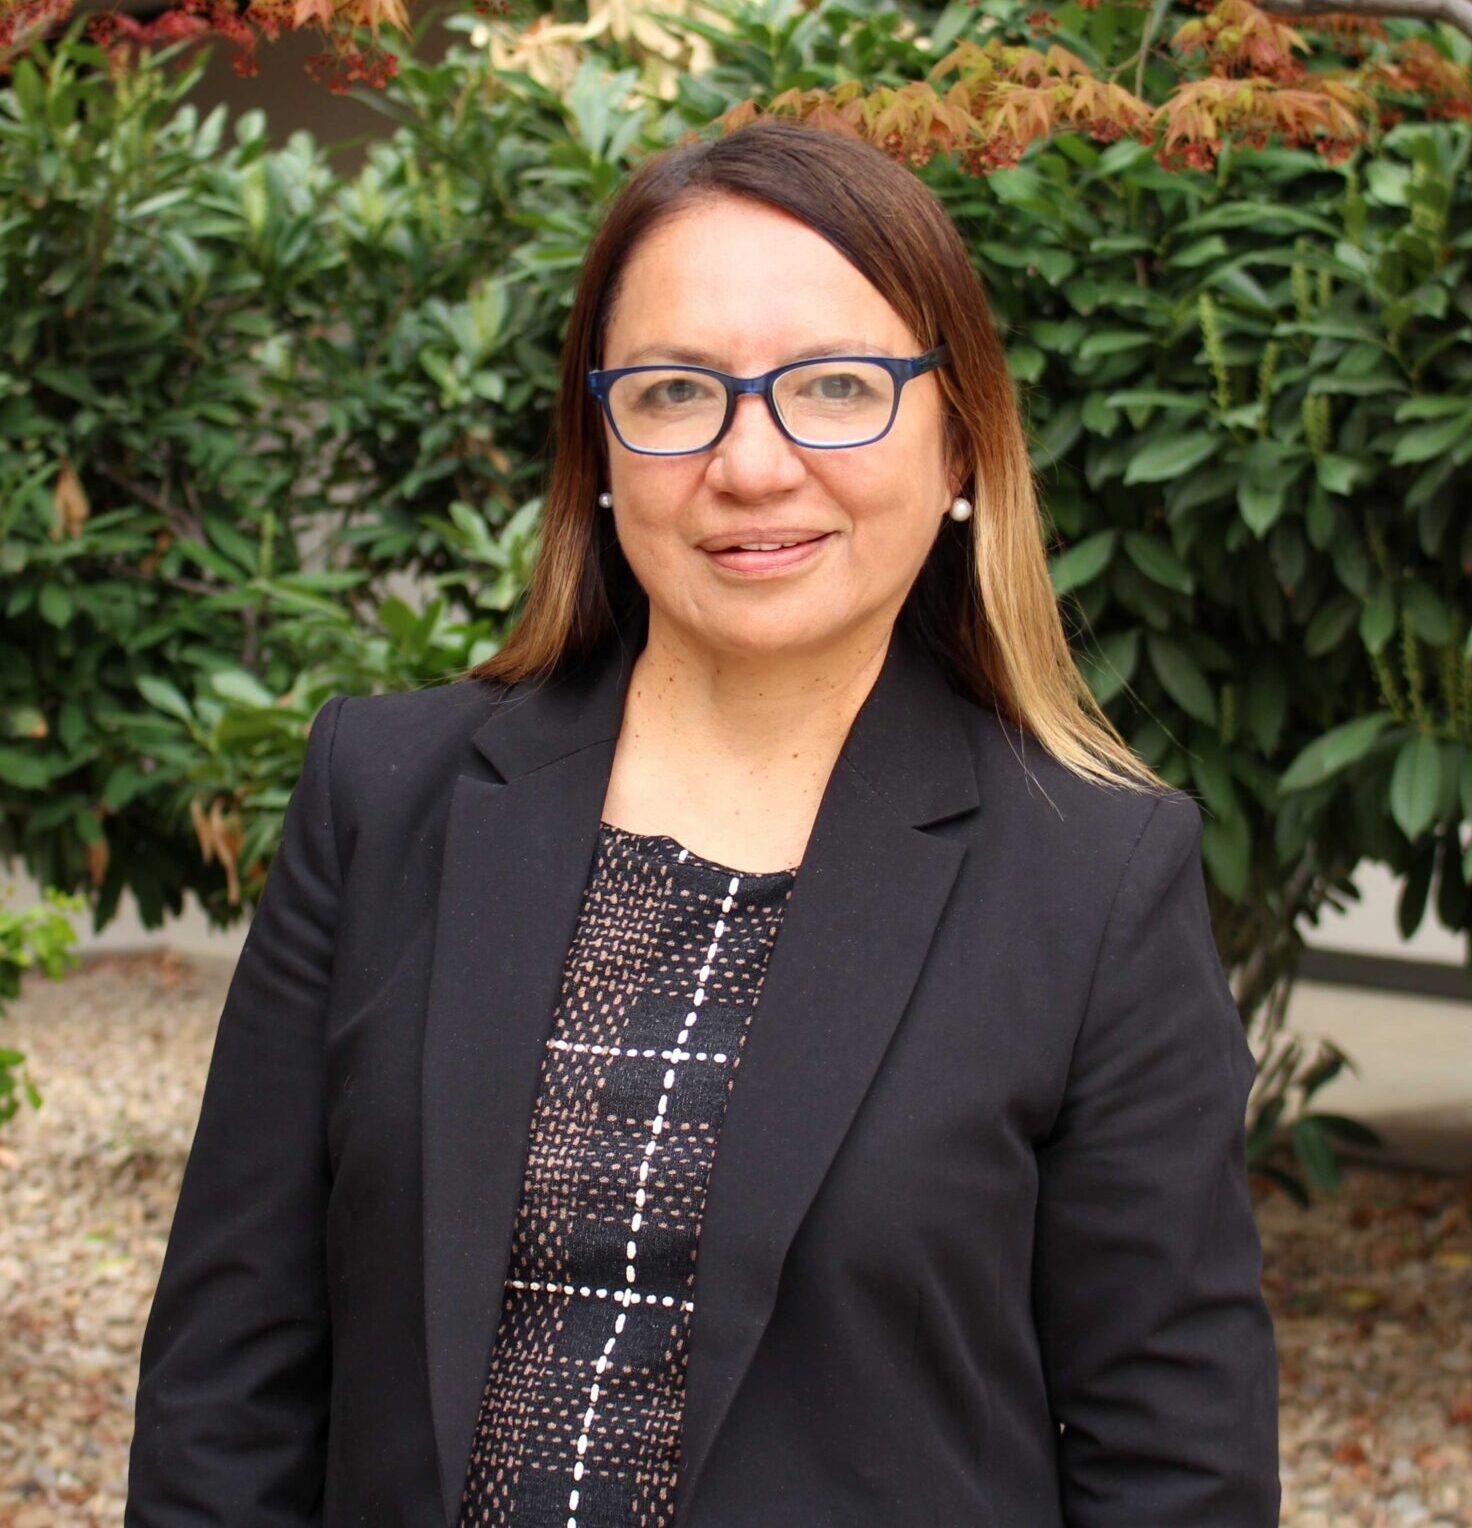 Legal cordinator Giovanna palacios headshot infront of trees